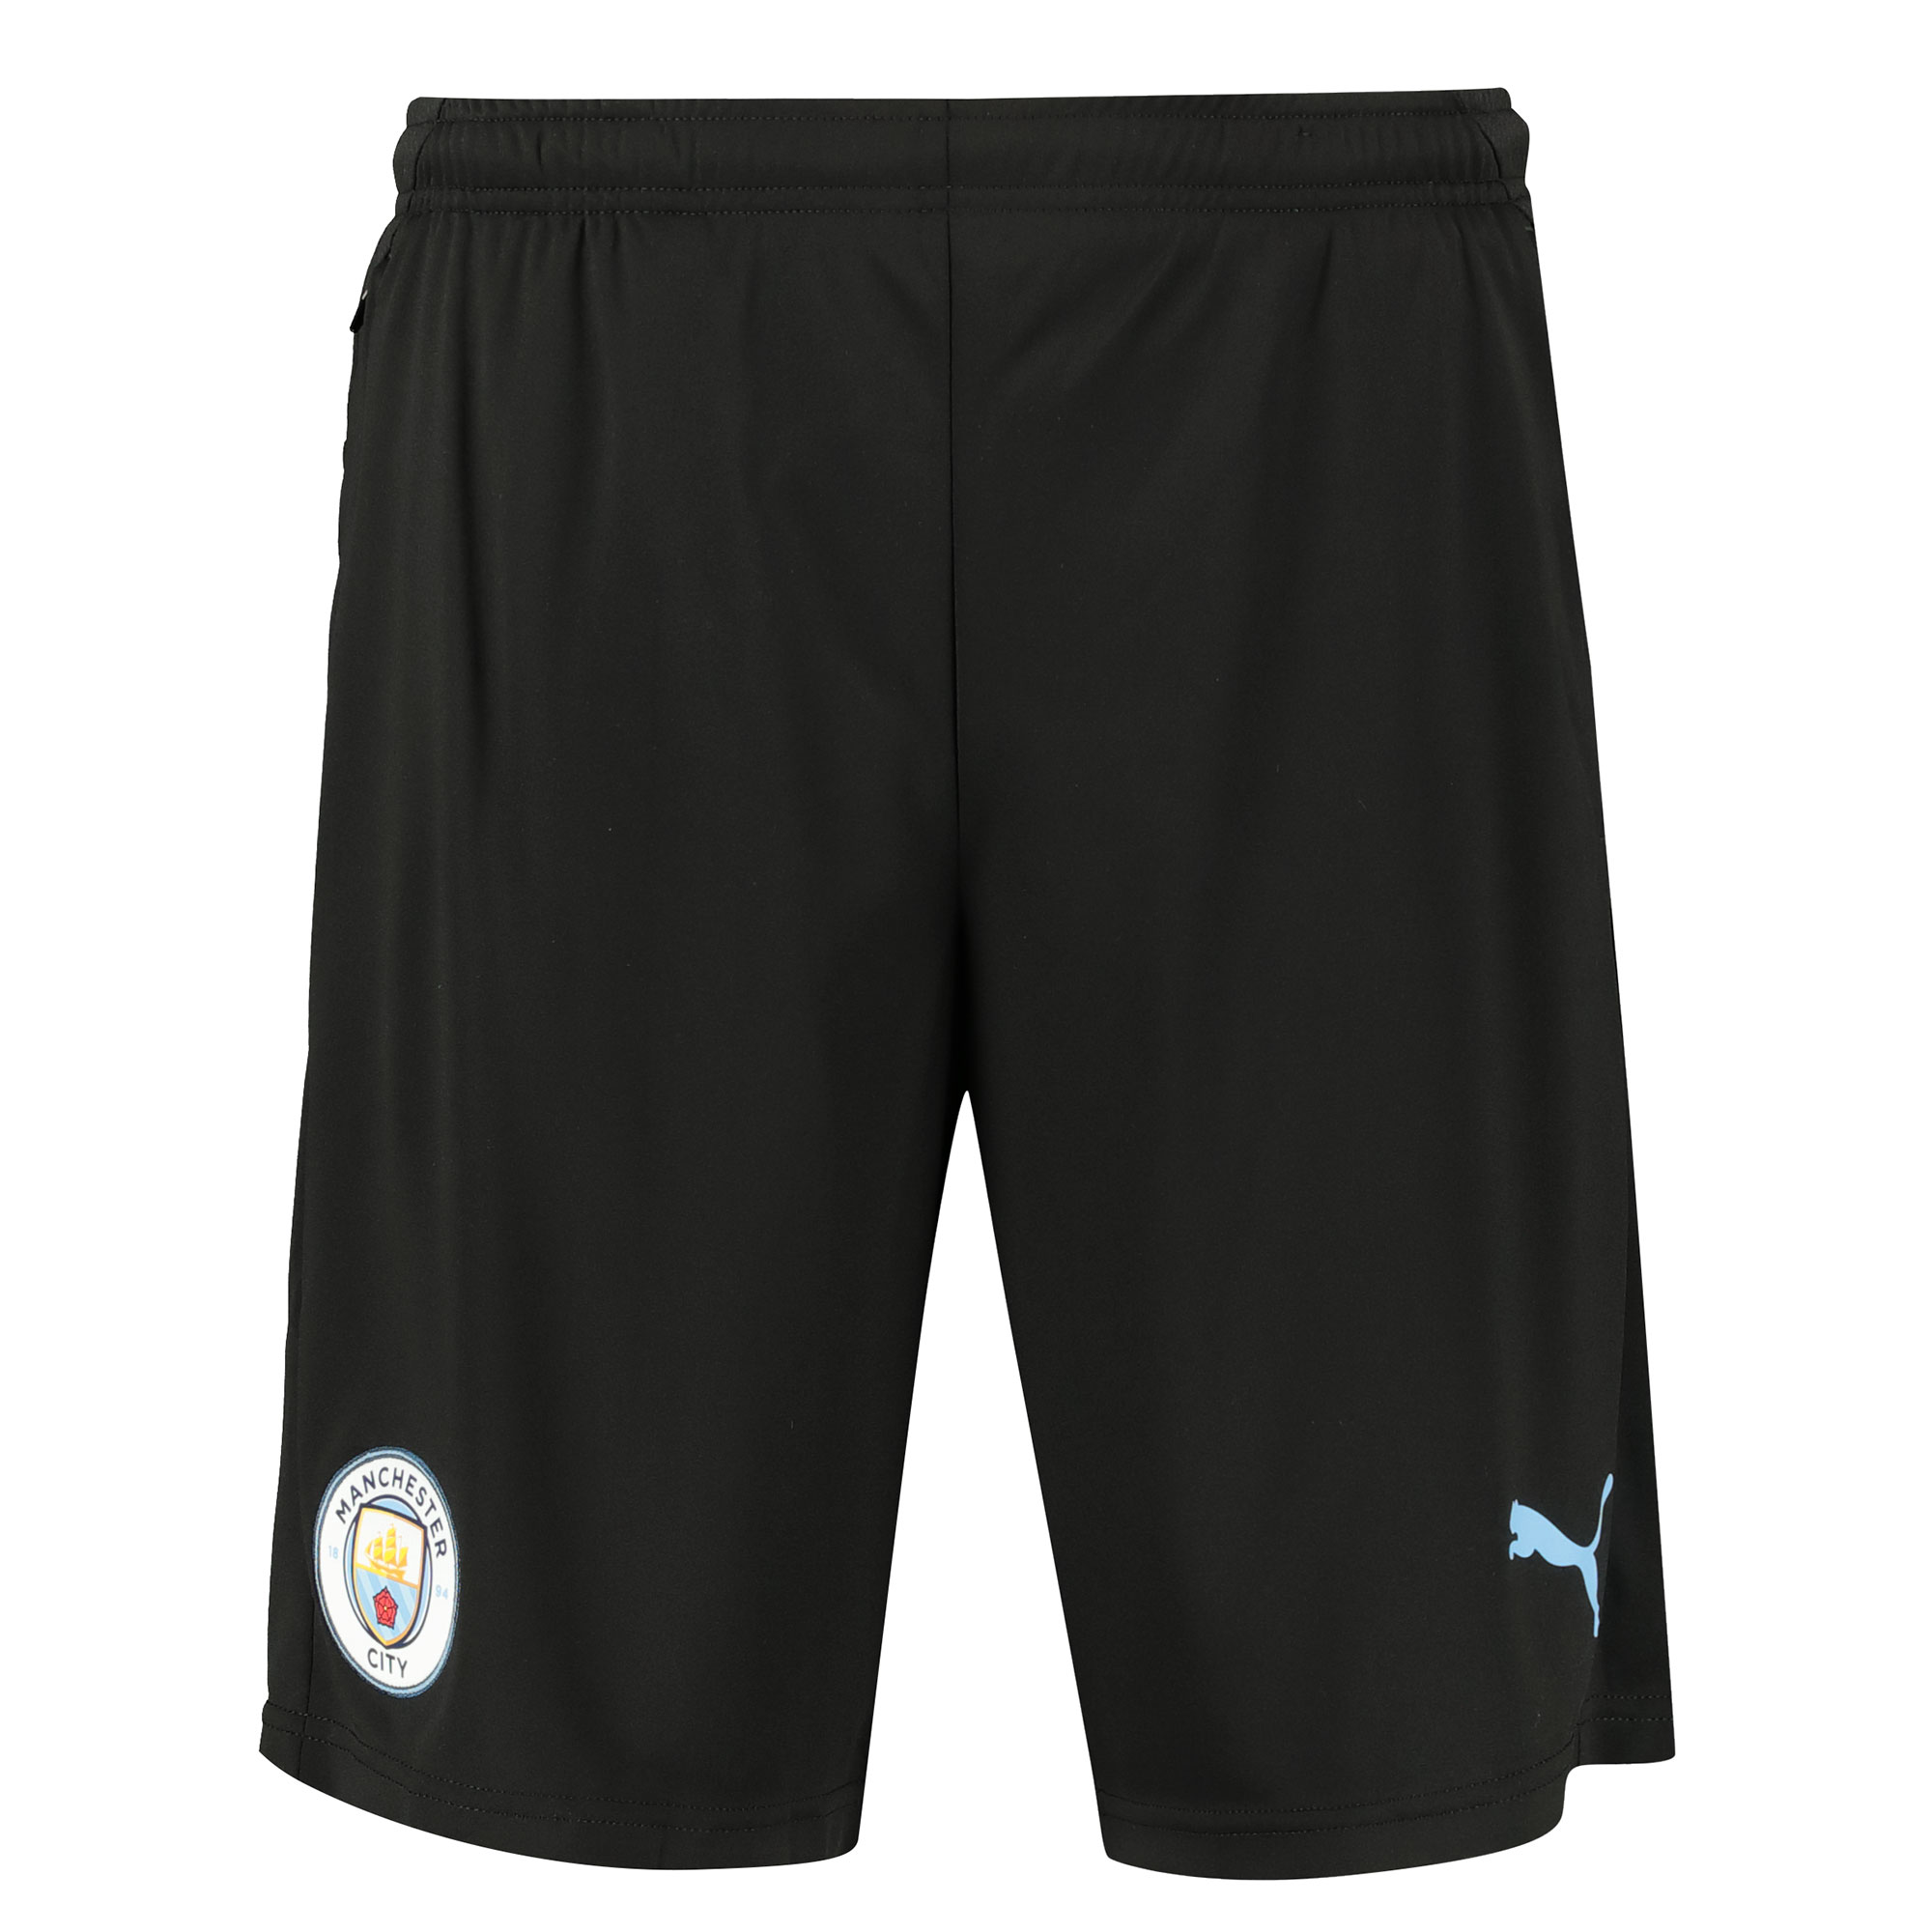 Manchester City Training Shorts - Black